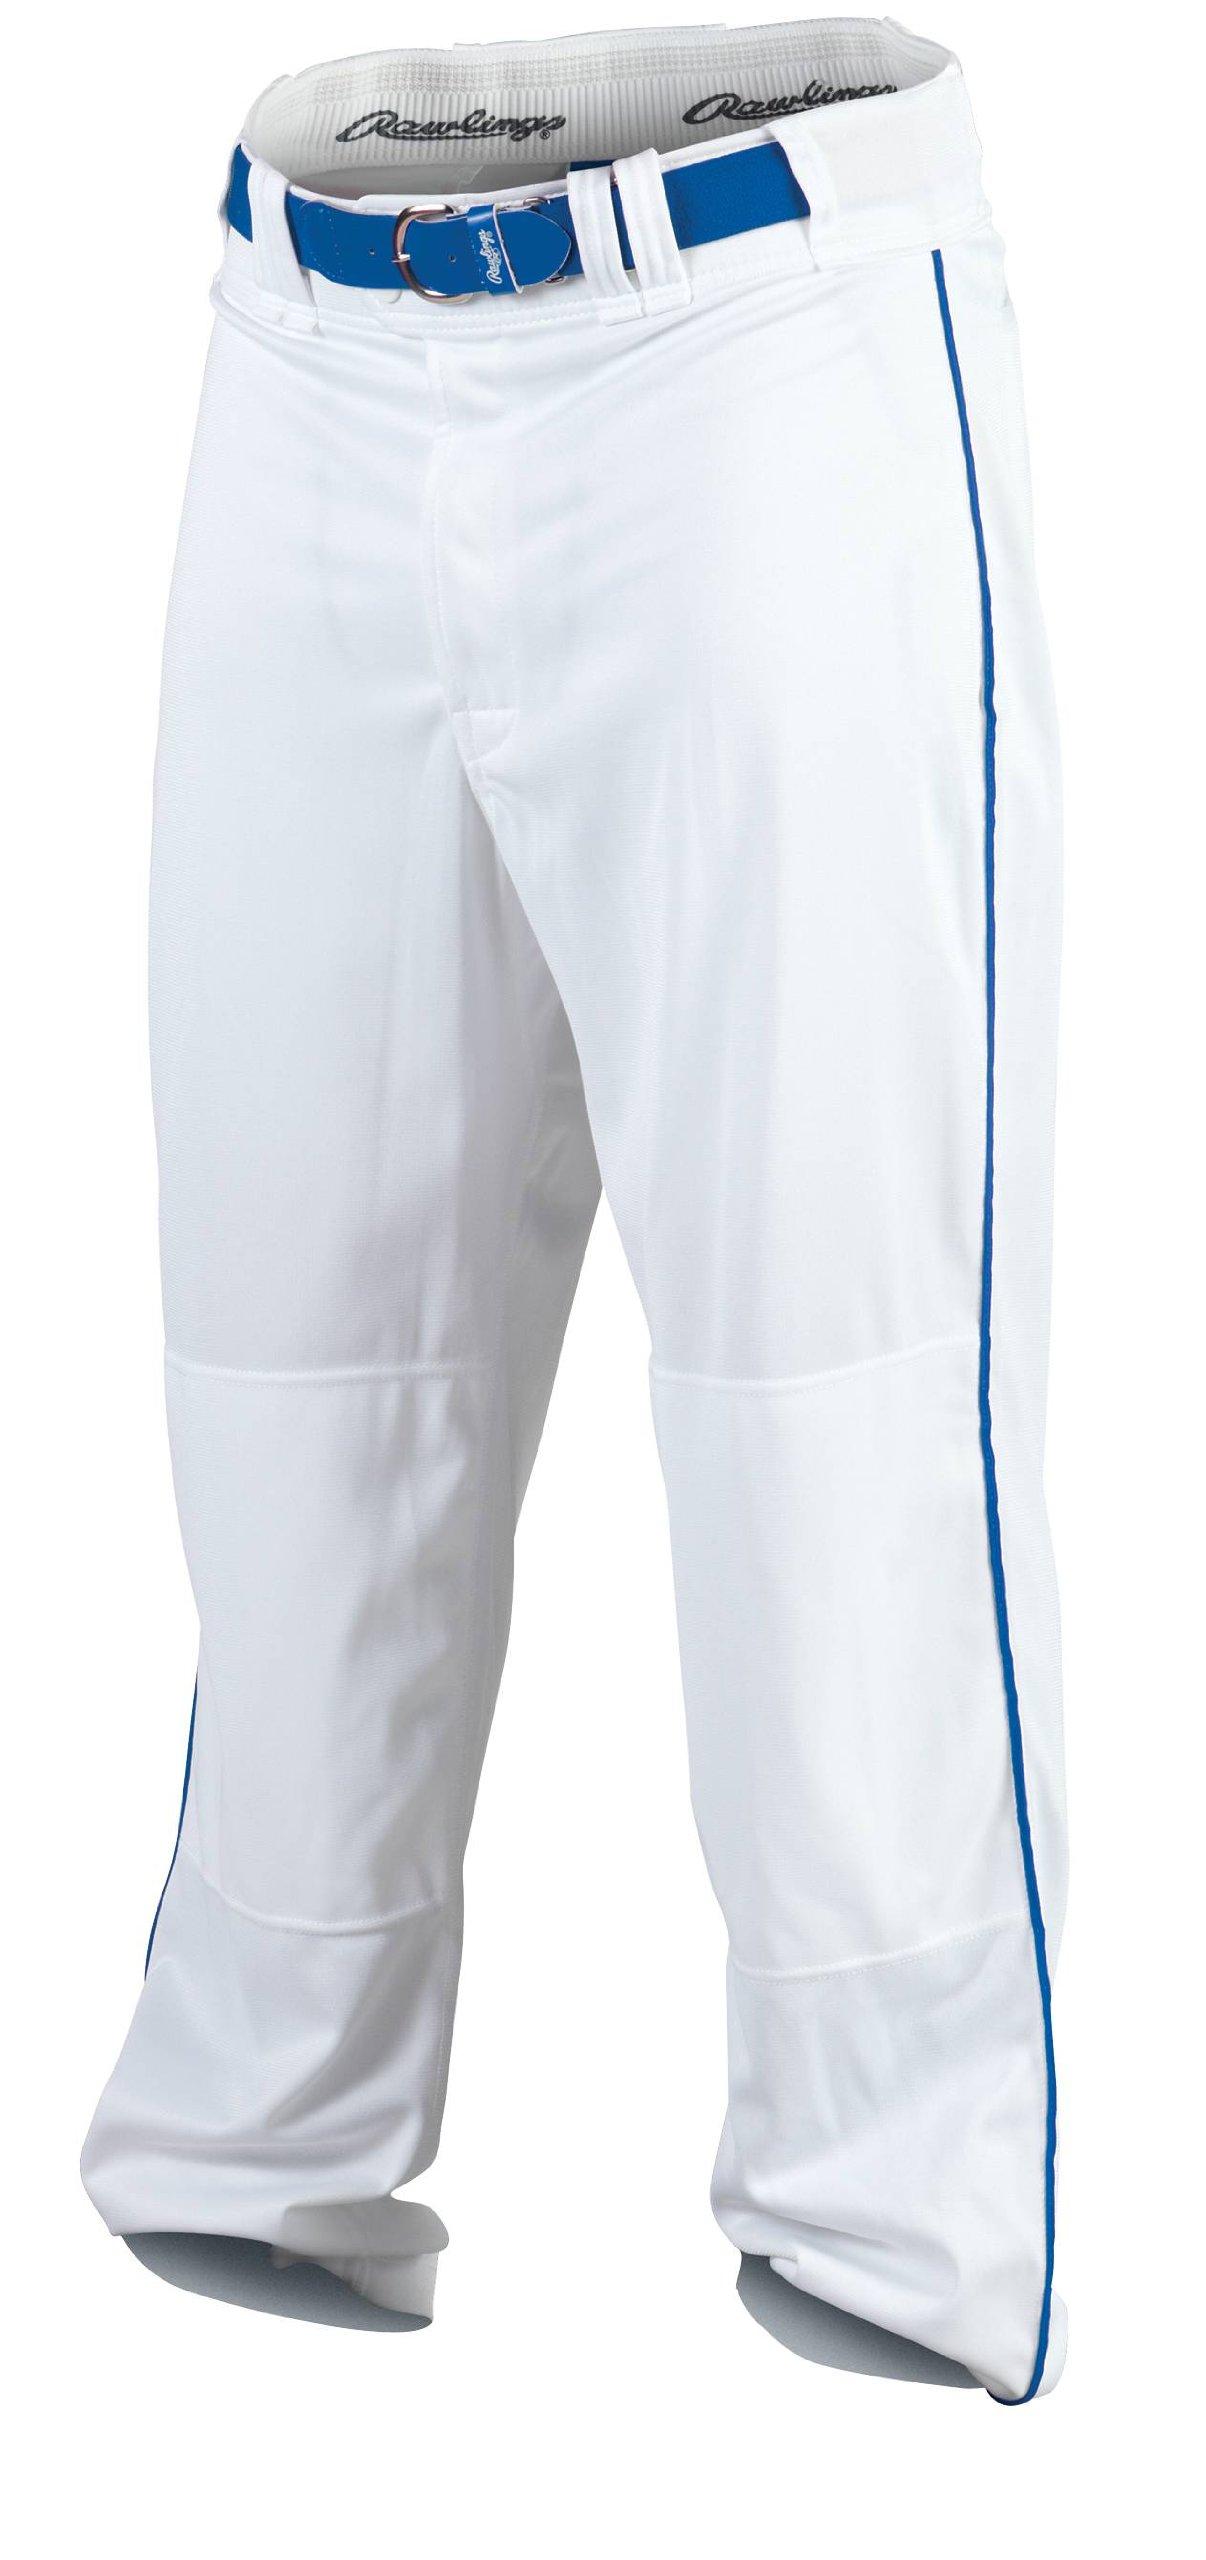 Rawlings Men's Baseball Pant (White/Royal, X-Large) by Rawlings